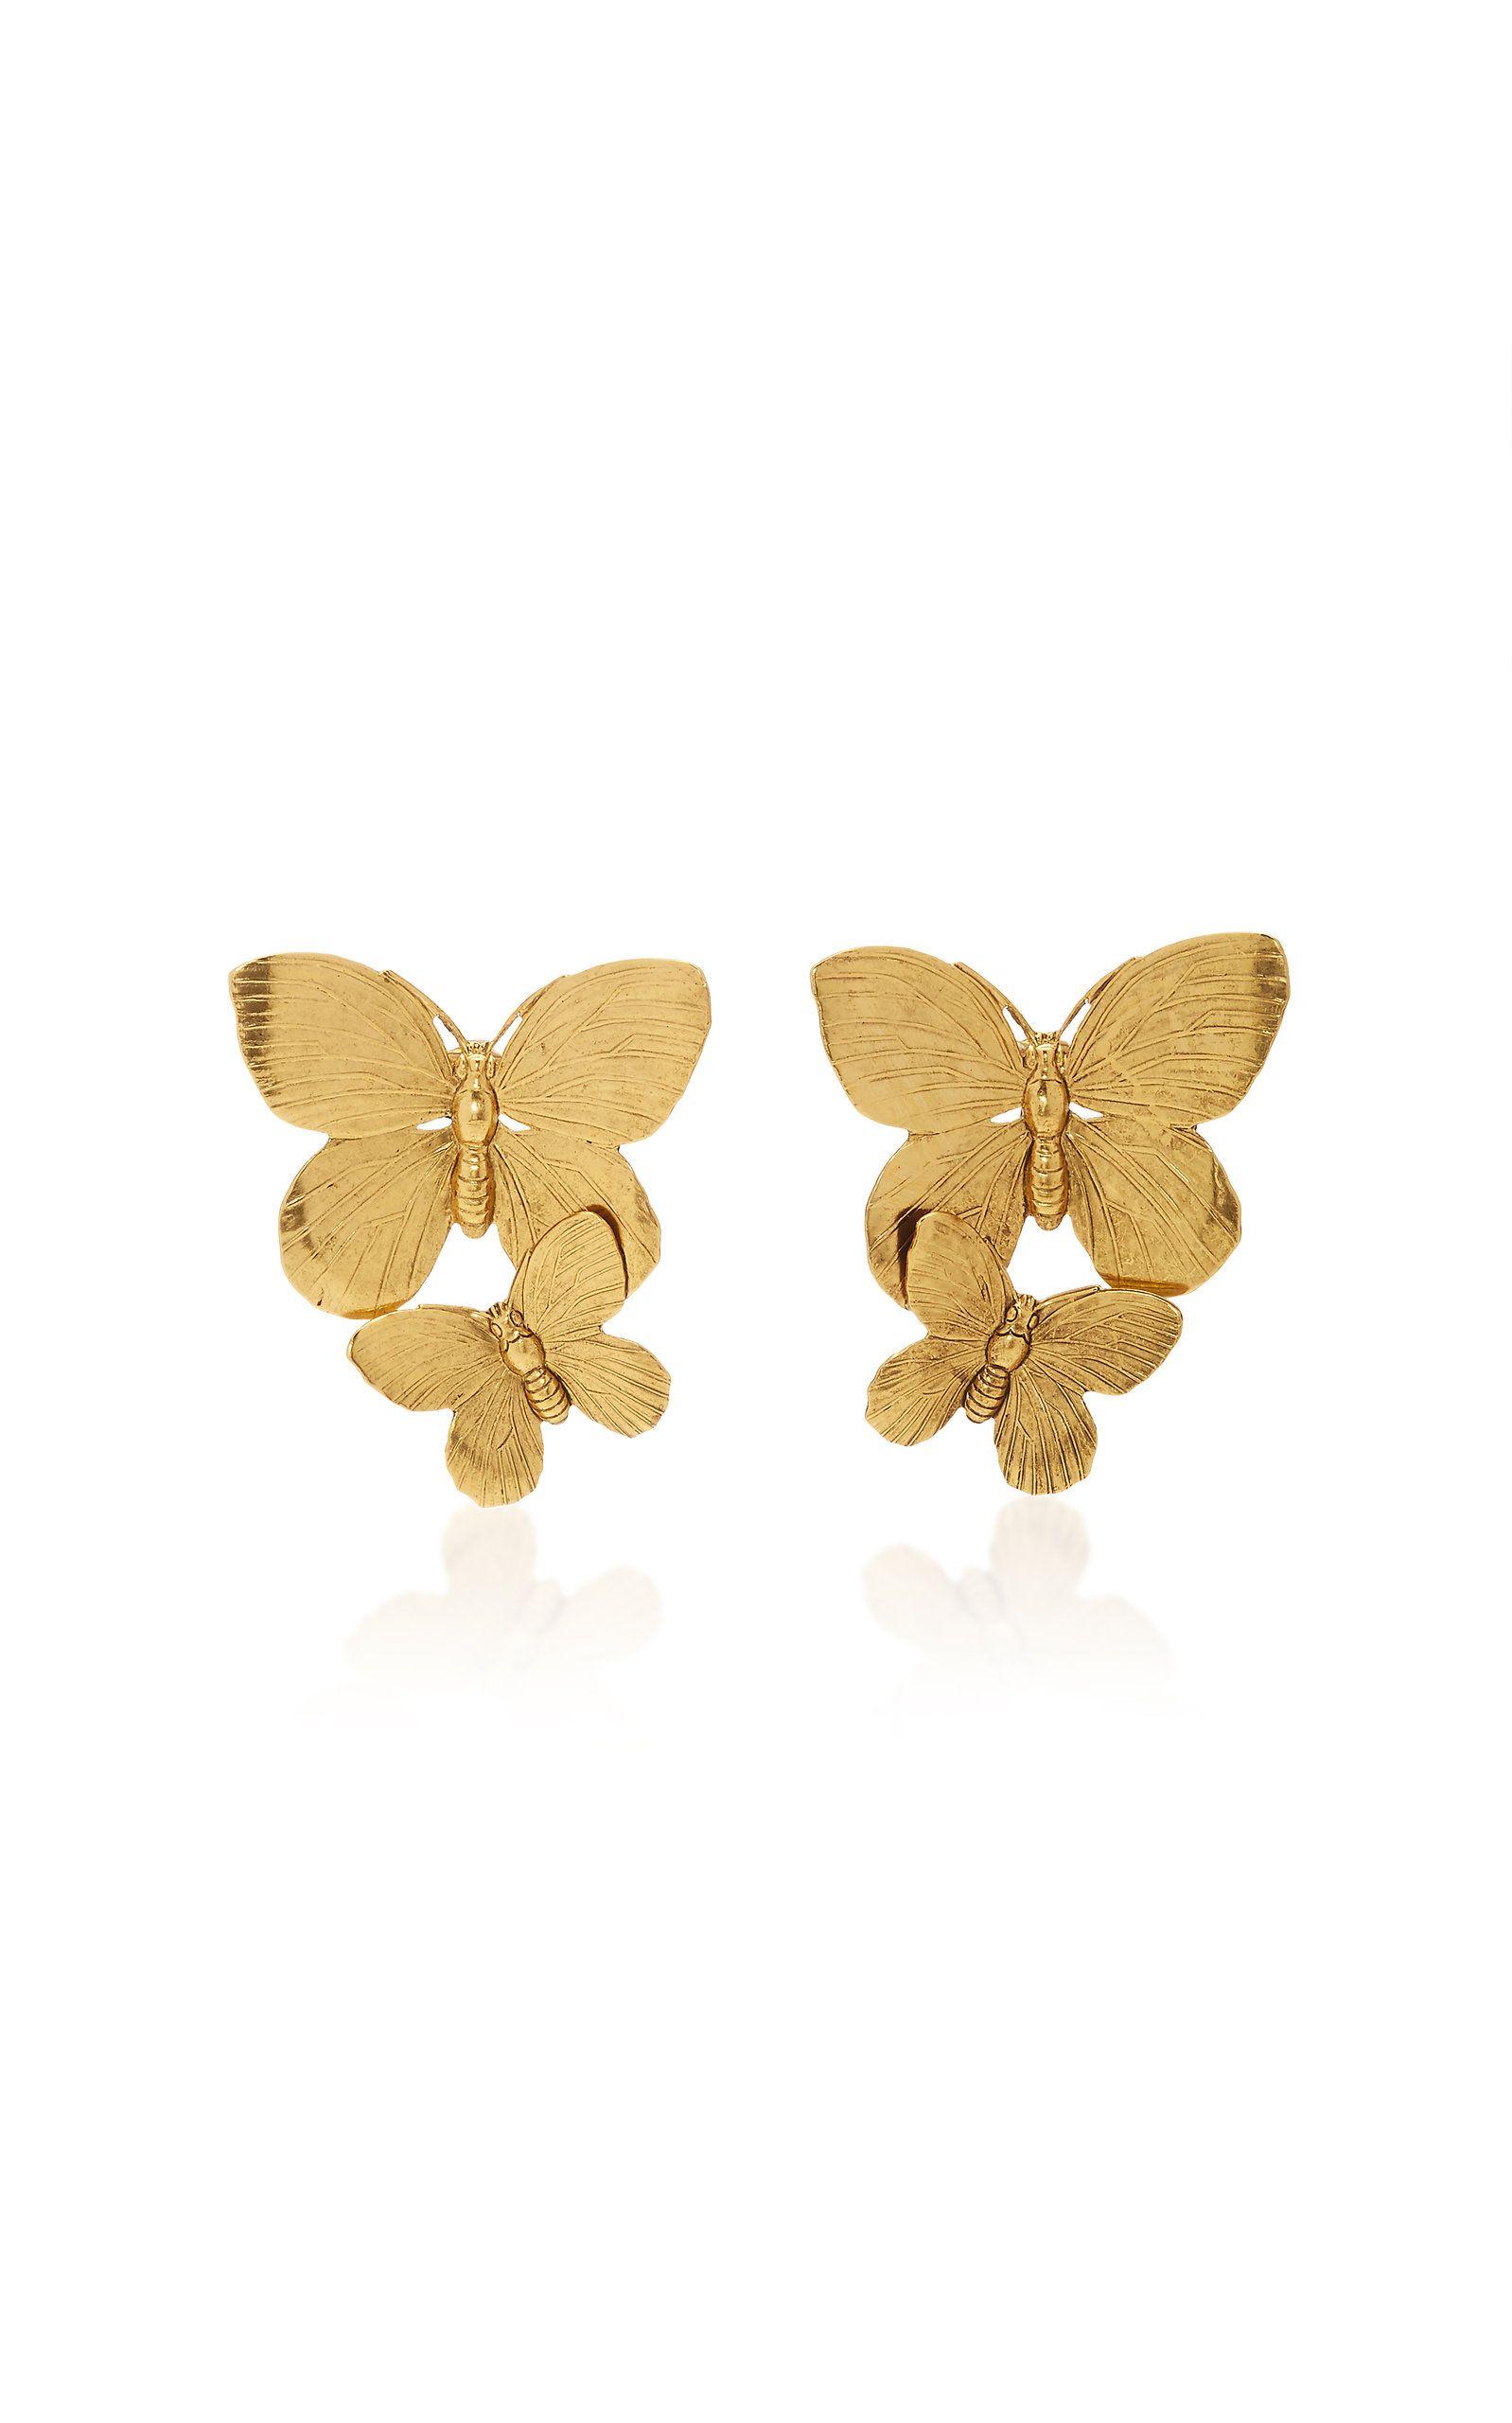 Papillon Earrings By Jennifer Behr For Preorder On Moda Operandi Papillon Moda Operandi Behr